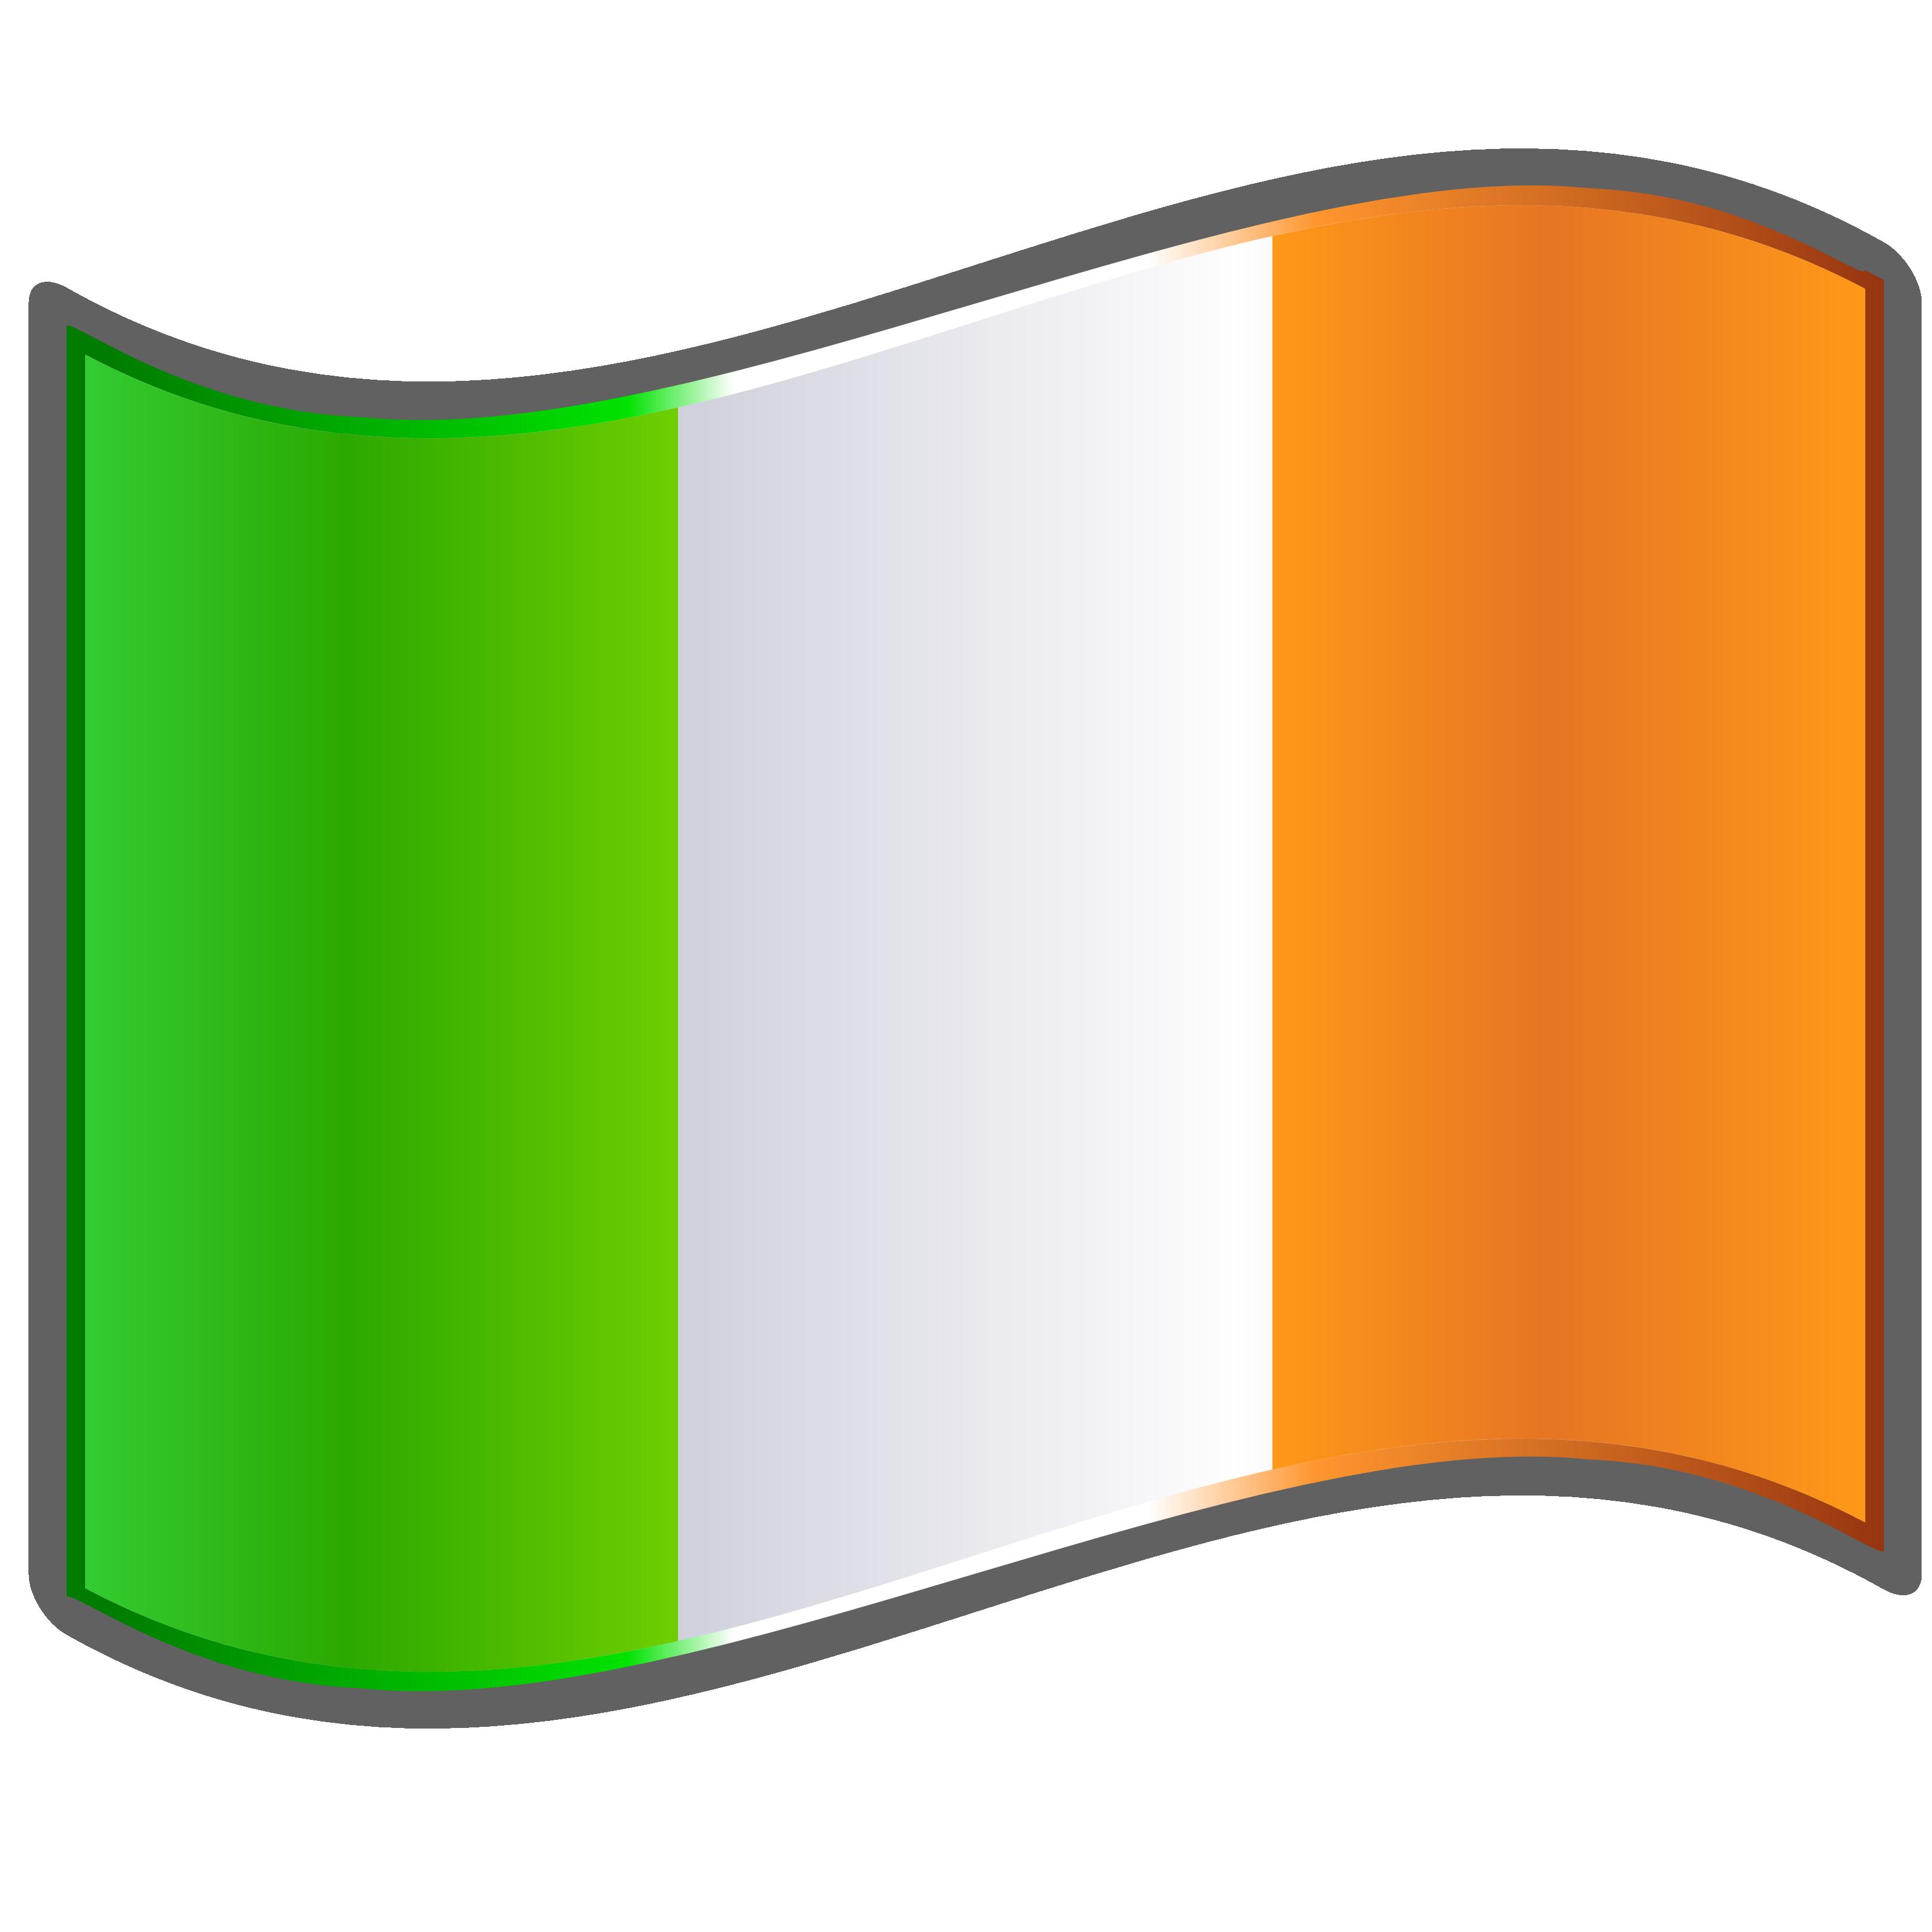 cliparts irland - photo #8